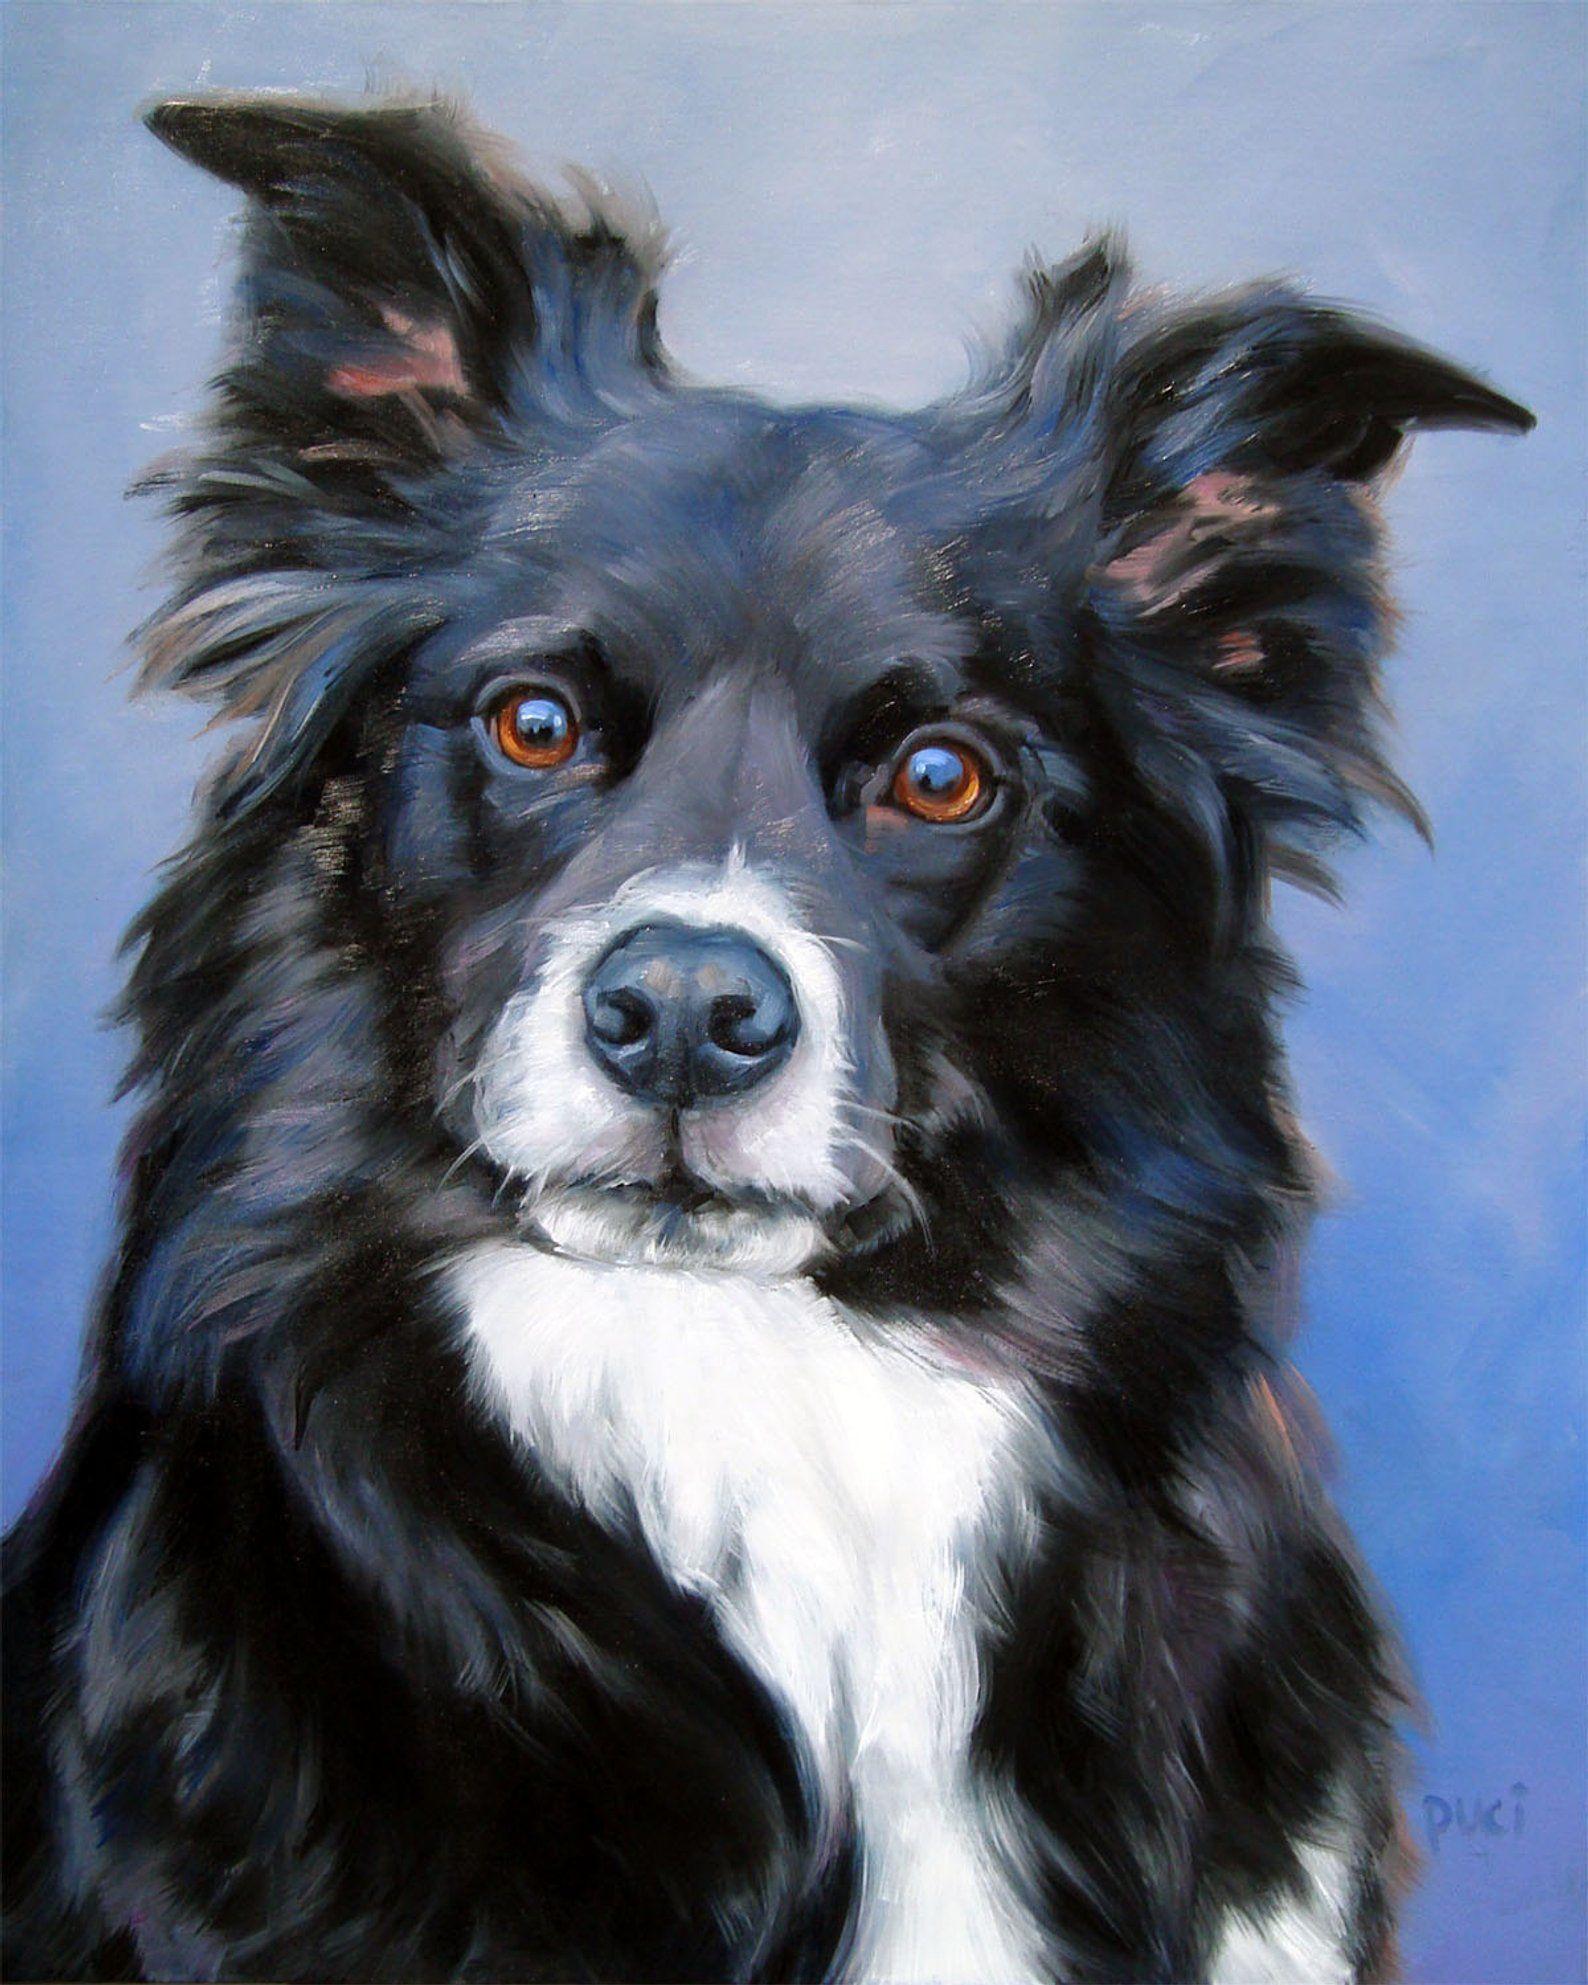 Custom Paintingpet portraitoil paintingpainting from your